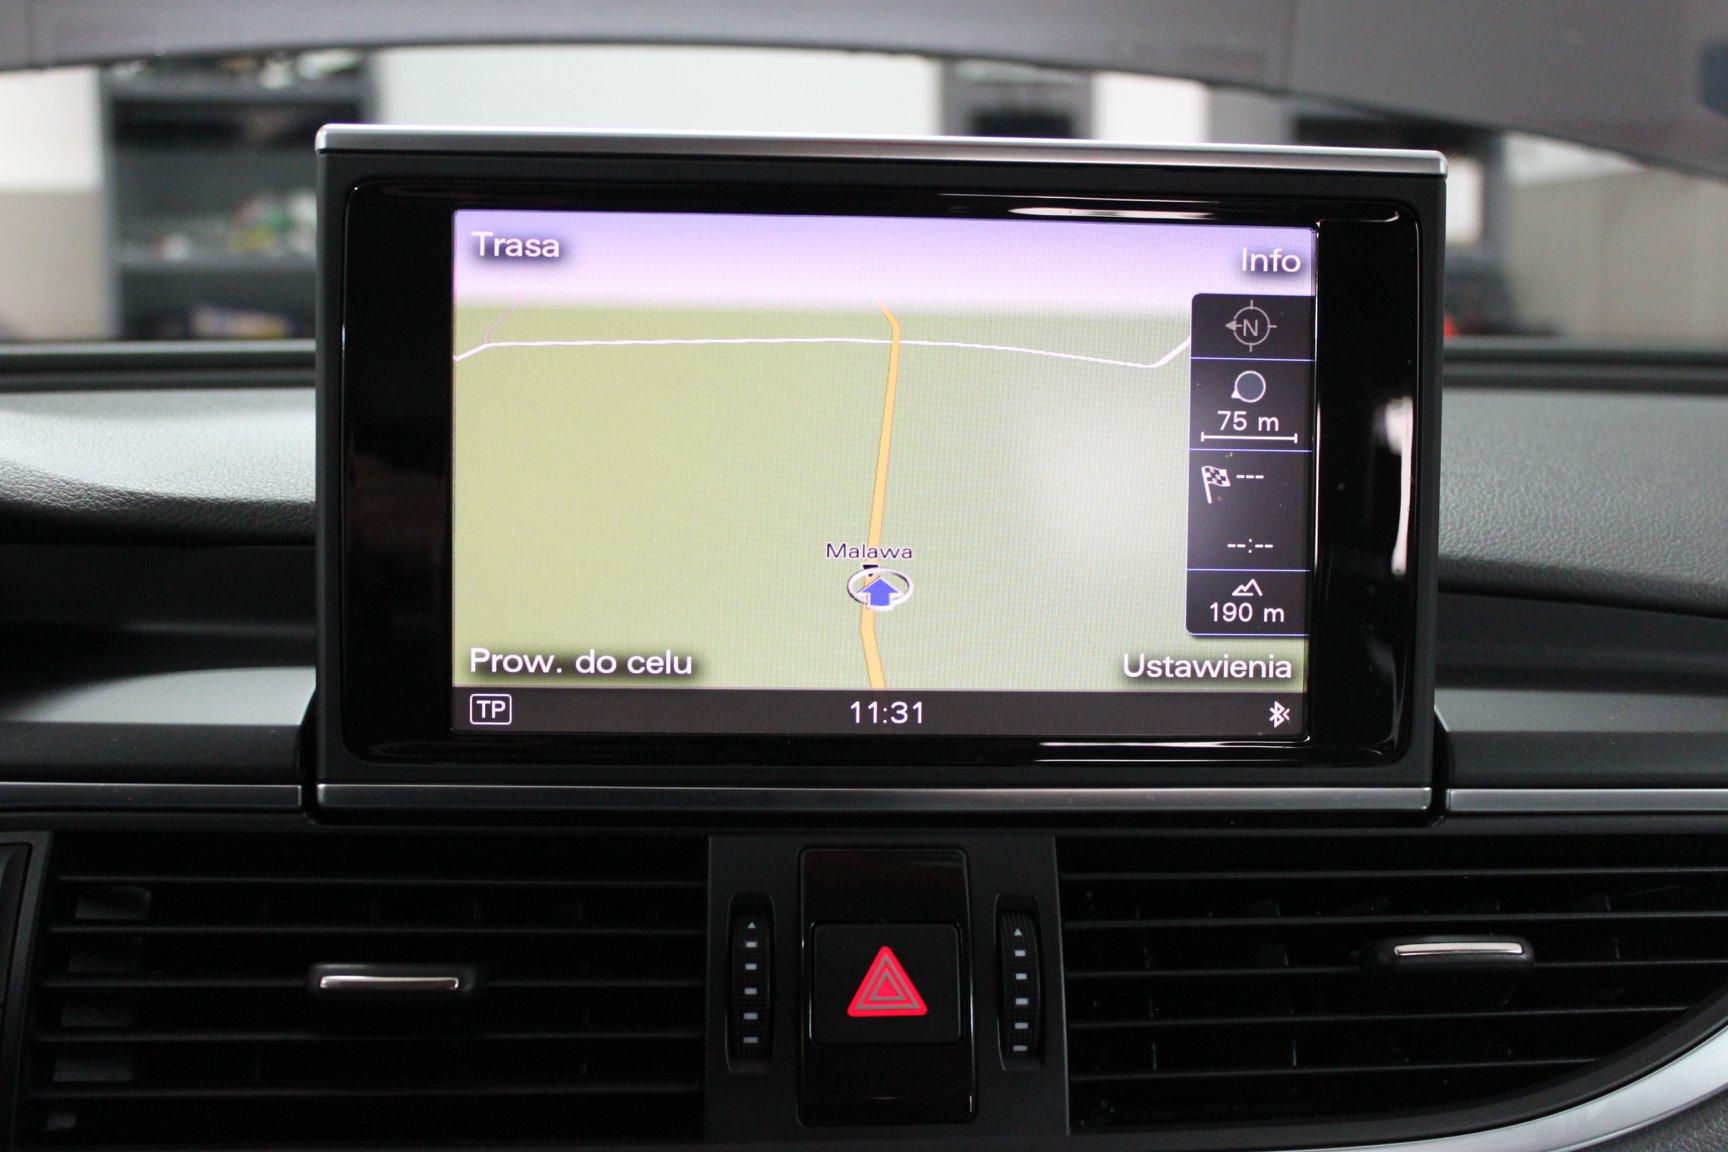 AUDI A7 3.0 TDI QUATTRO 2012